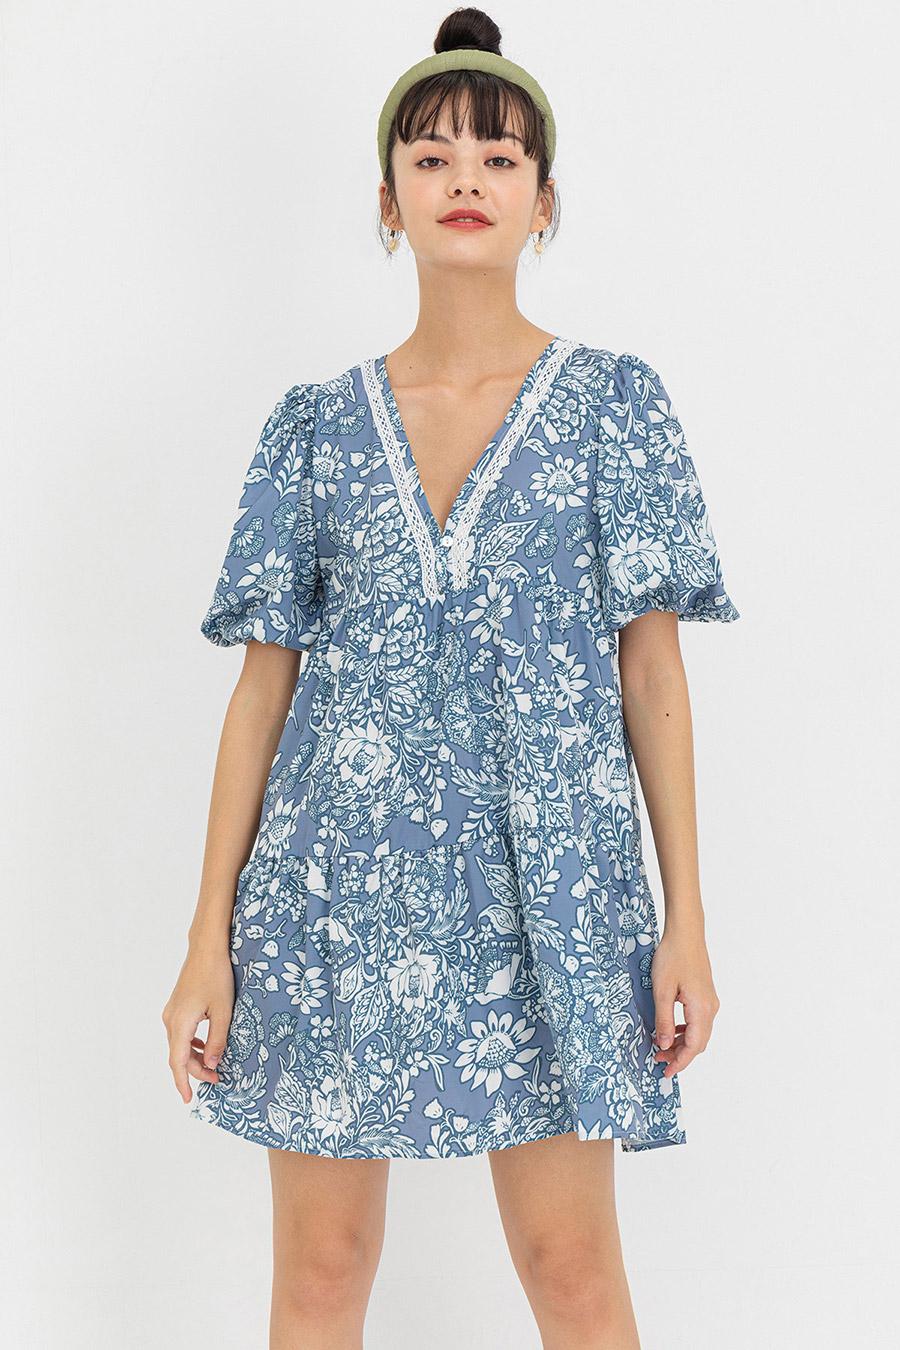 EMELINA DRESS - BLEU FLEUR